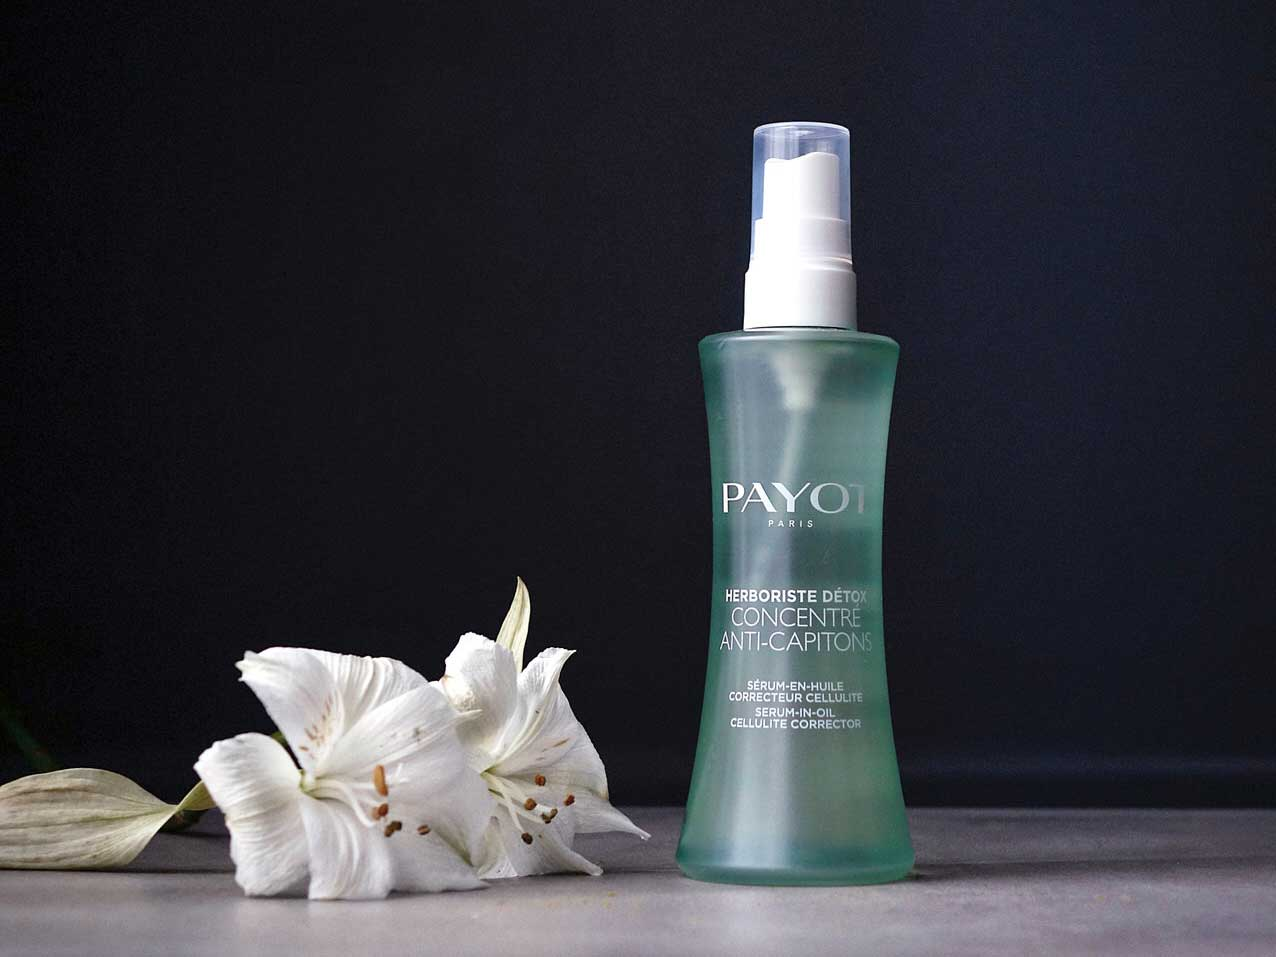 Topsi Produkte Körperpflege Anti-Cellulite Spray Payot